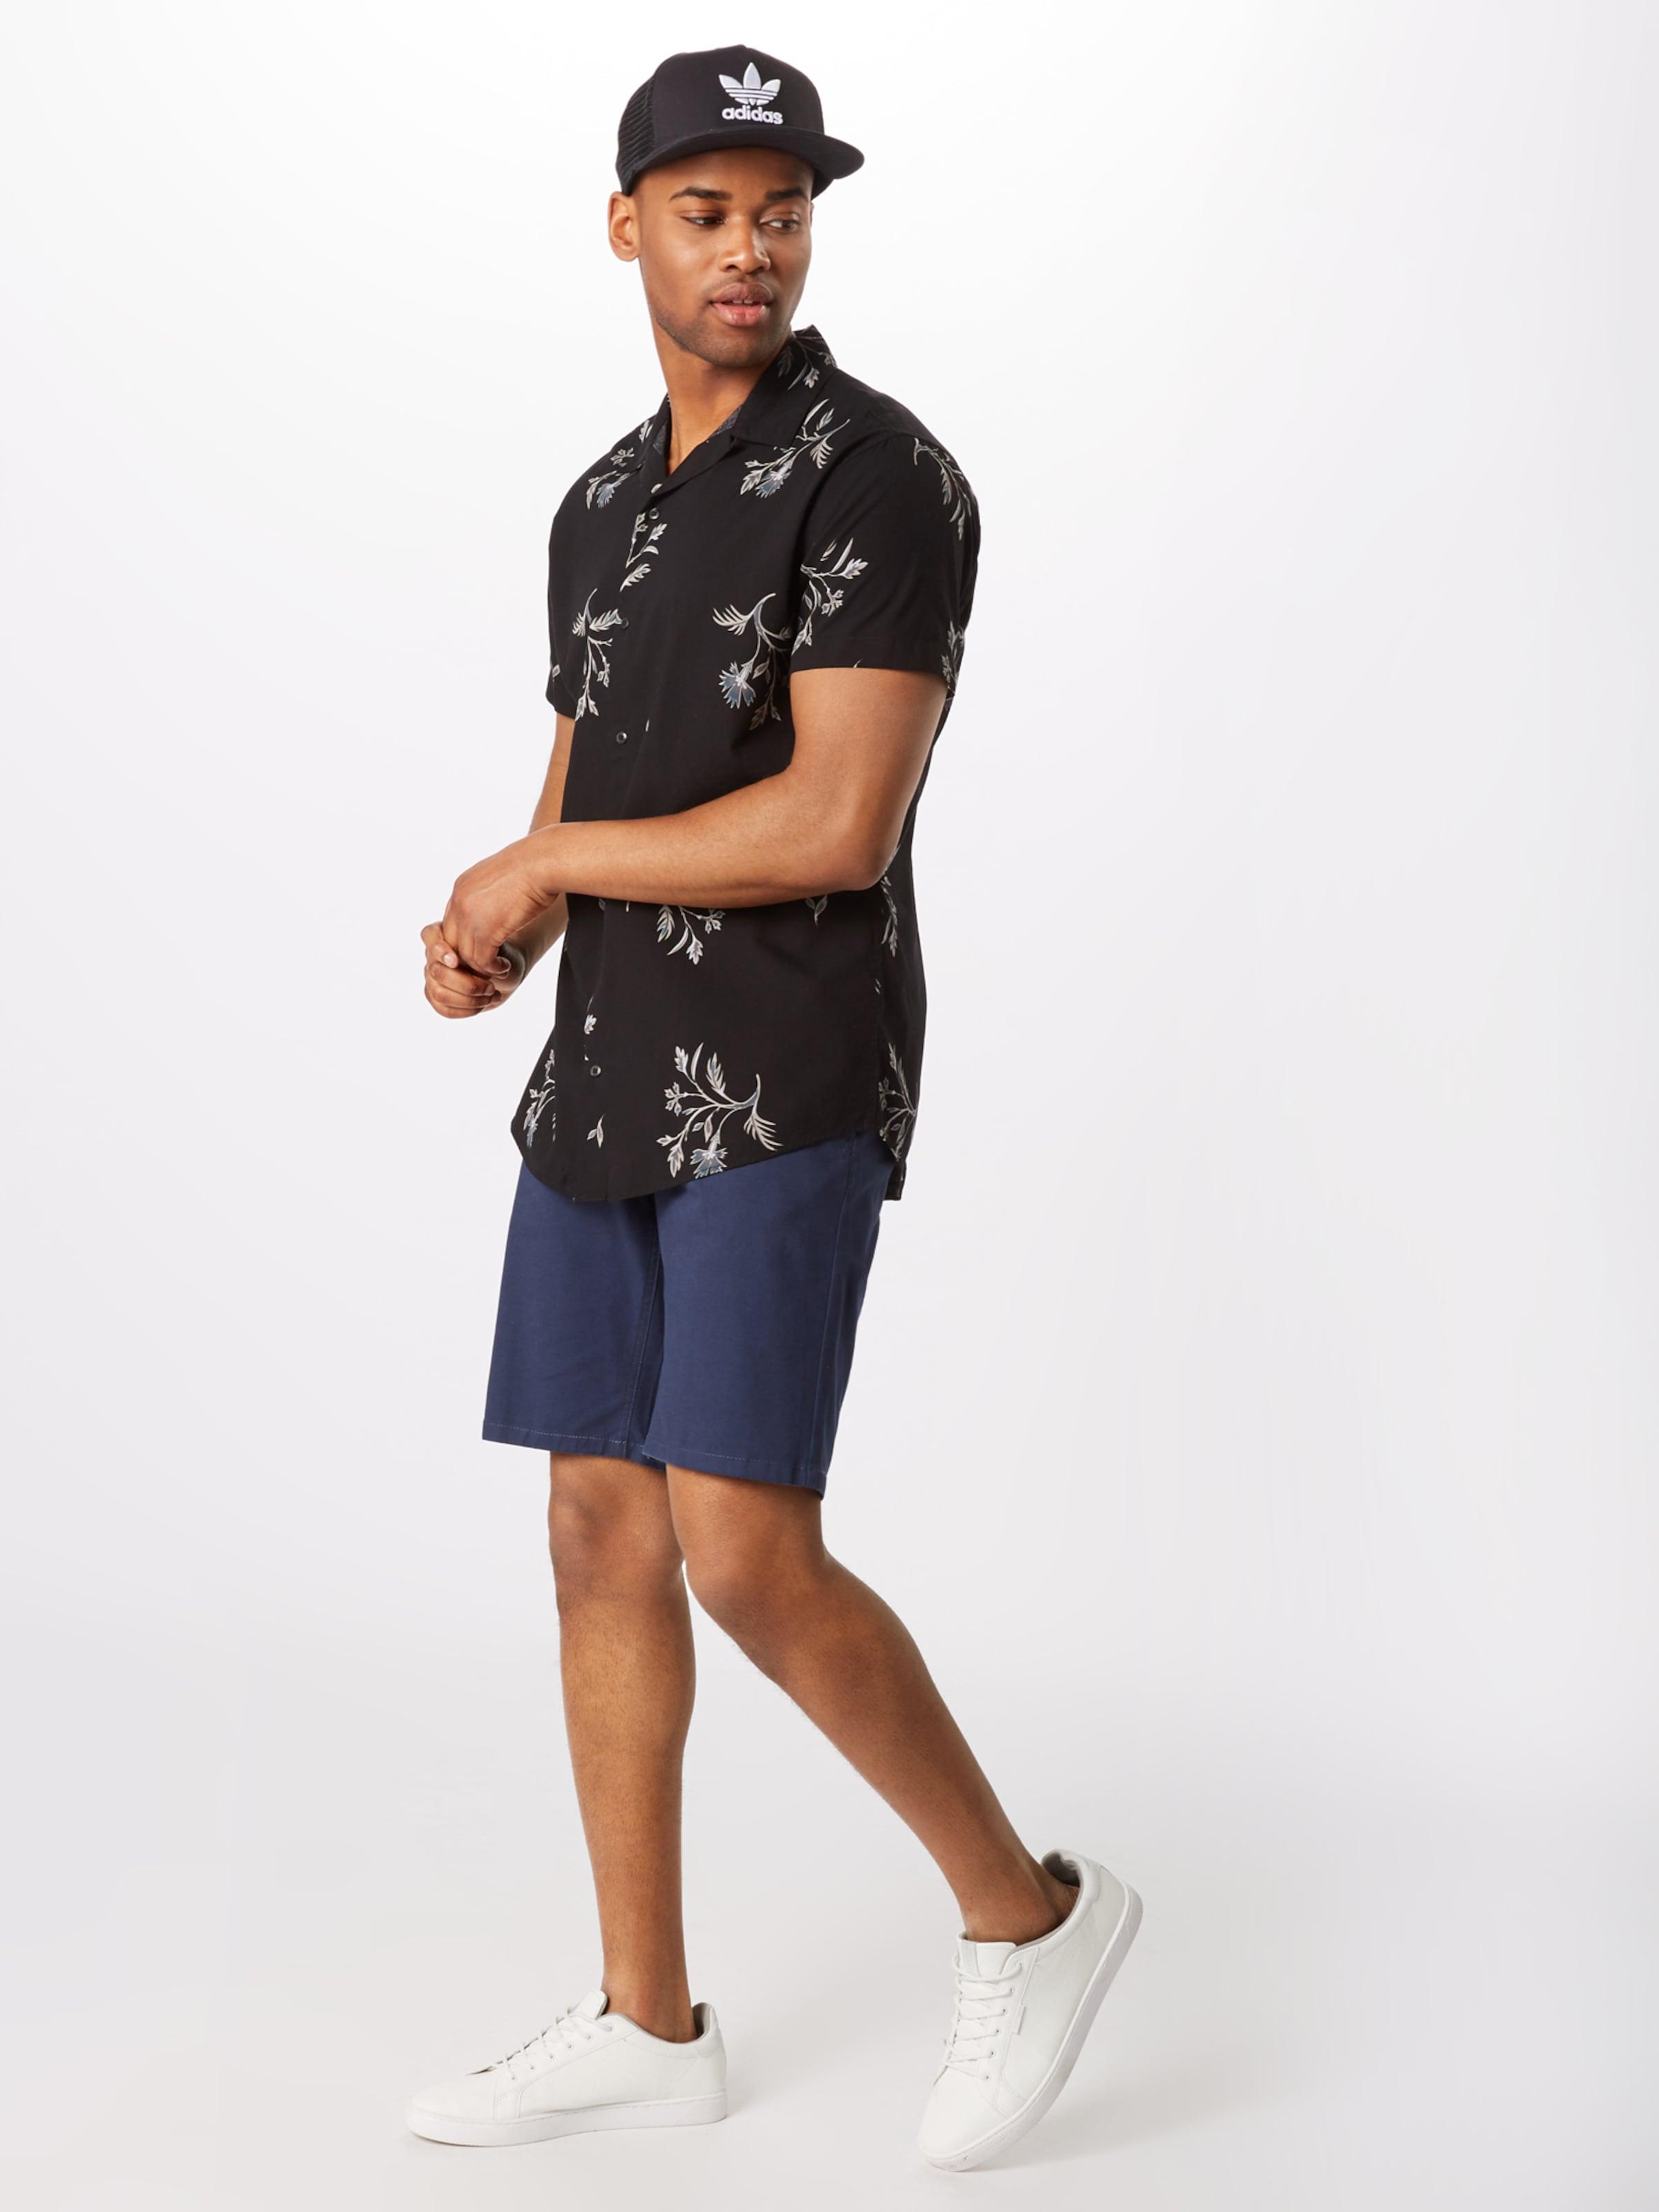 Jackamp; BeigeGrau Hemd Schwarz Jones In 8kPXn0Ow